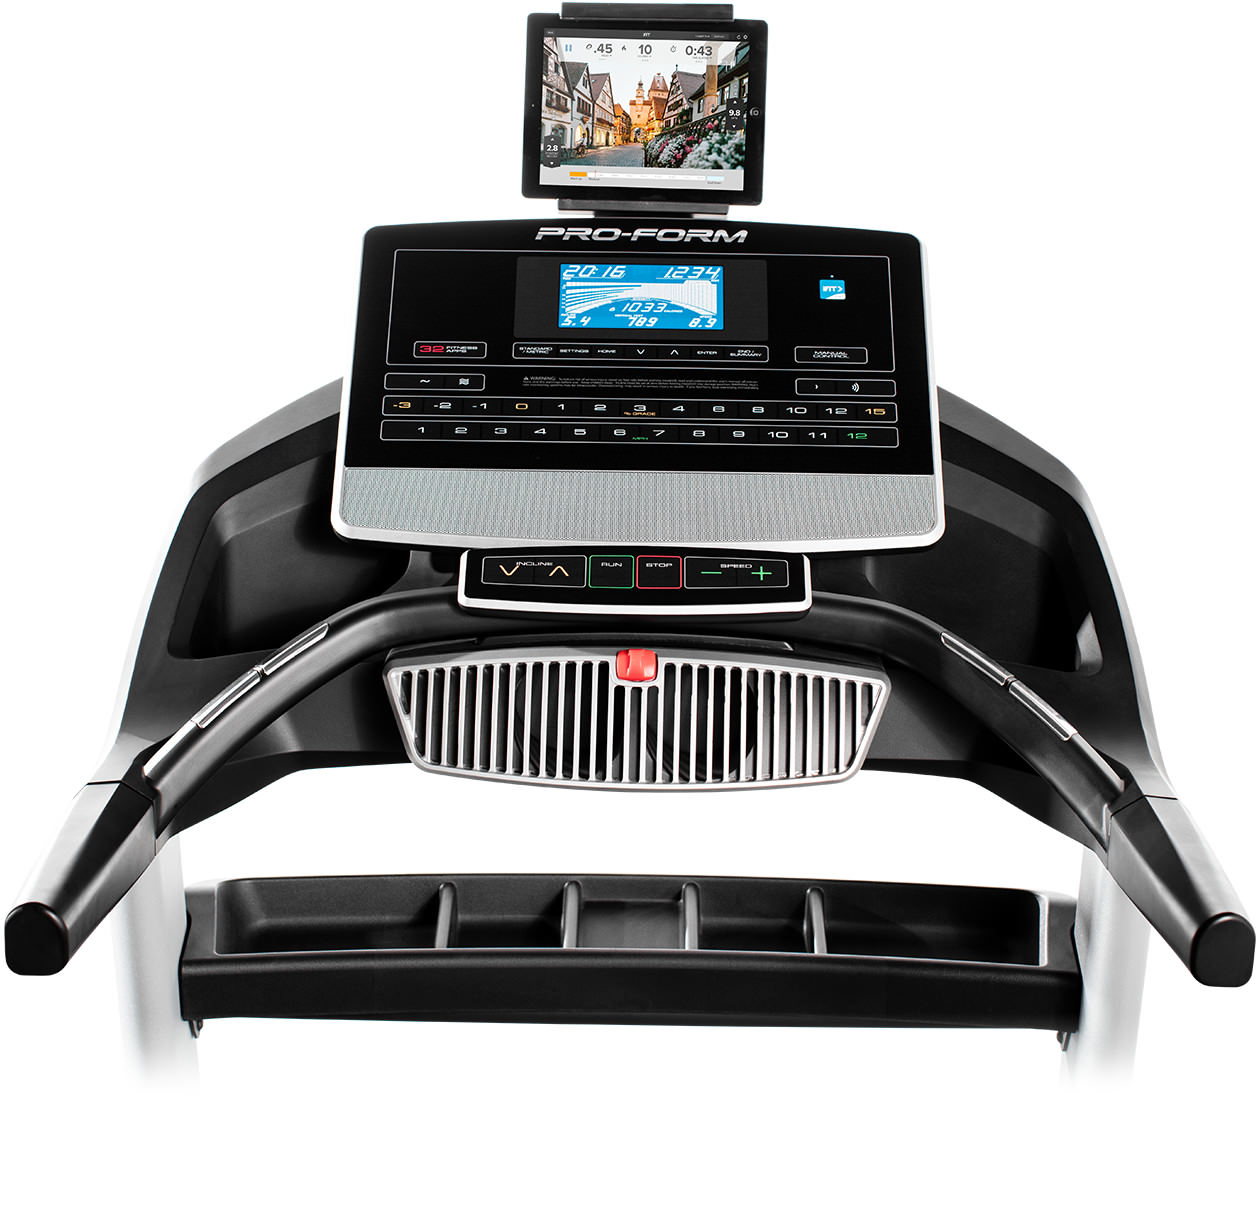 Proform Pro 5000 Review 2016: Proform-2000-treadmill-console-2017